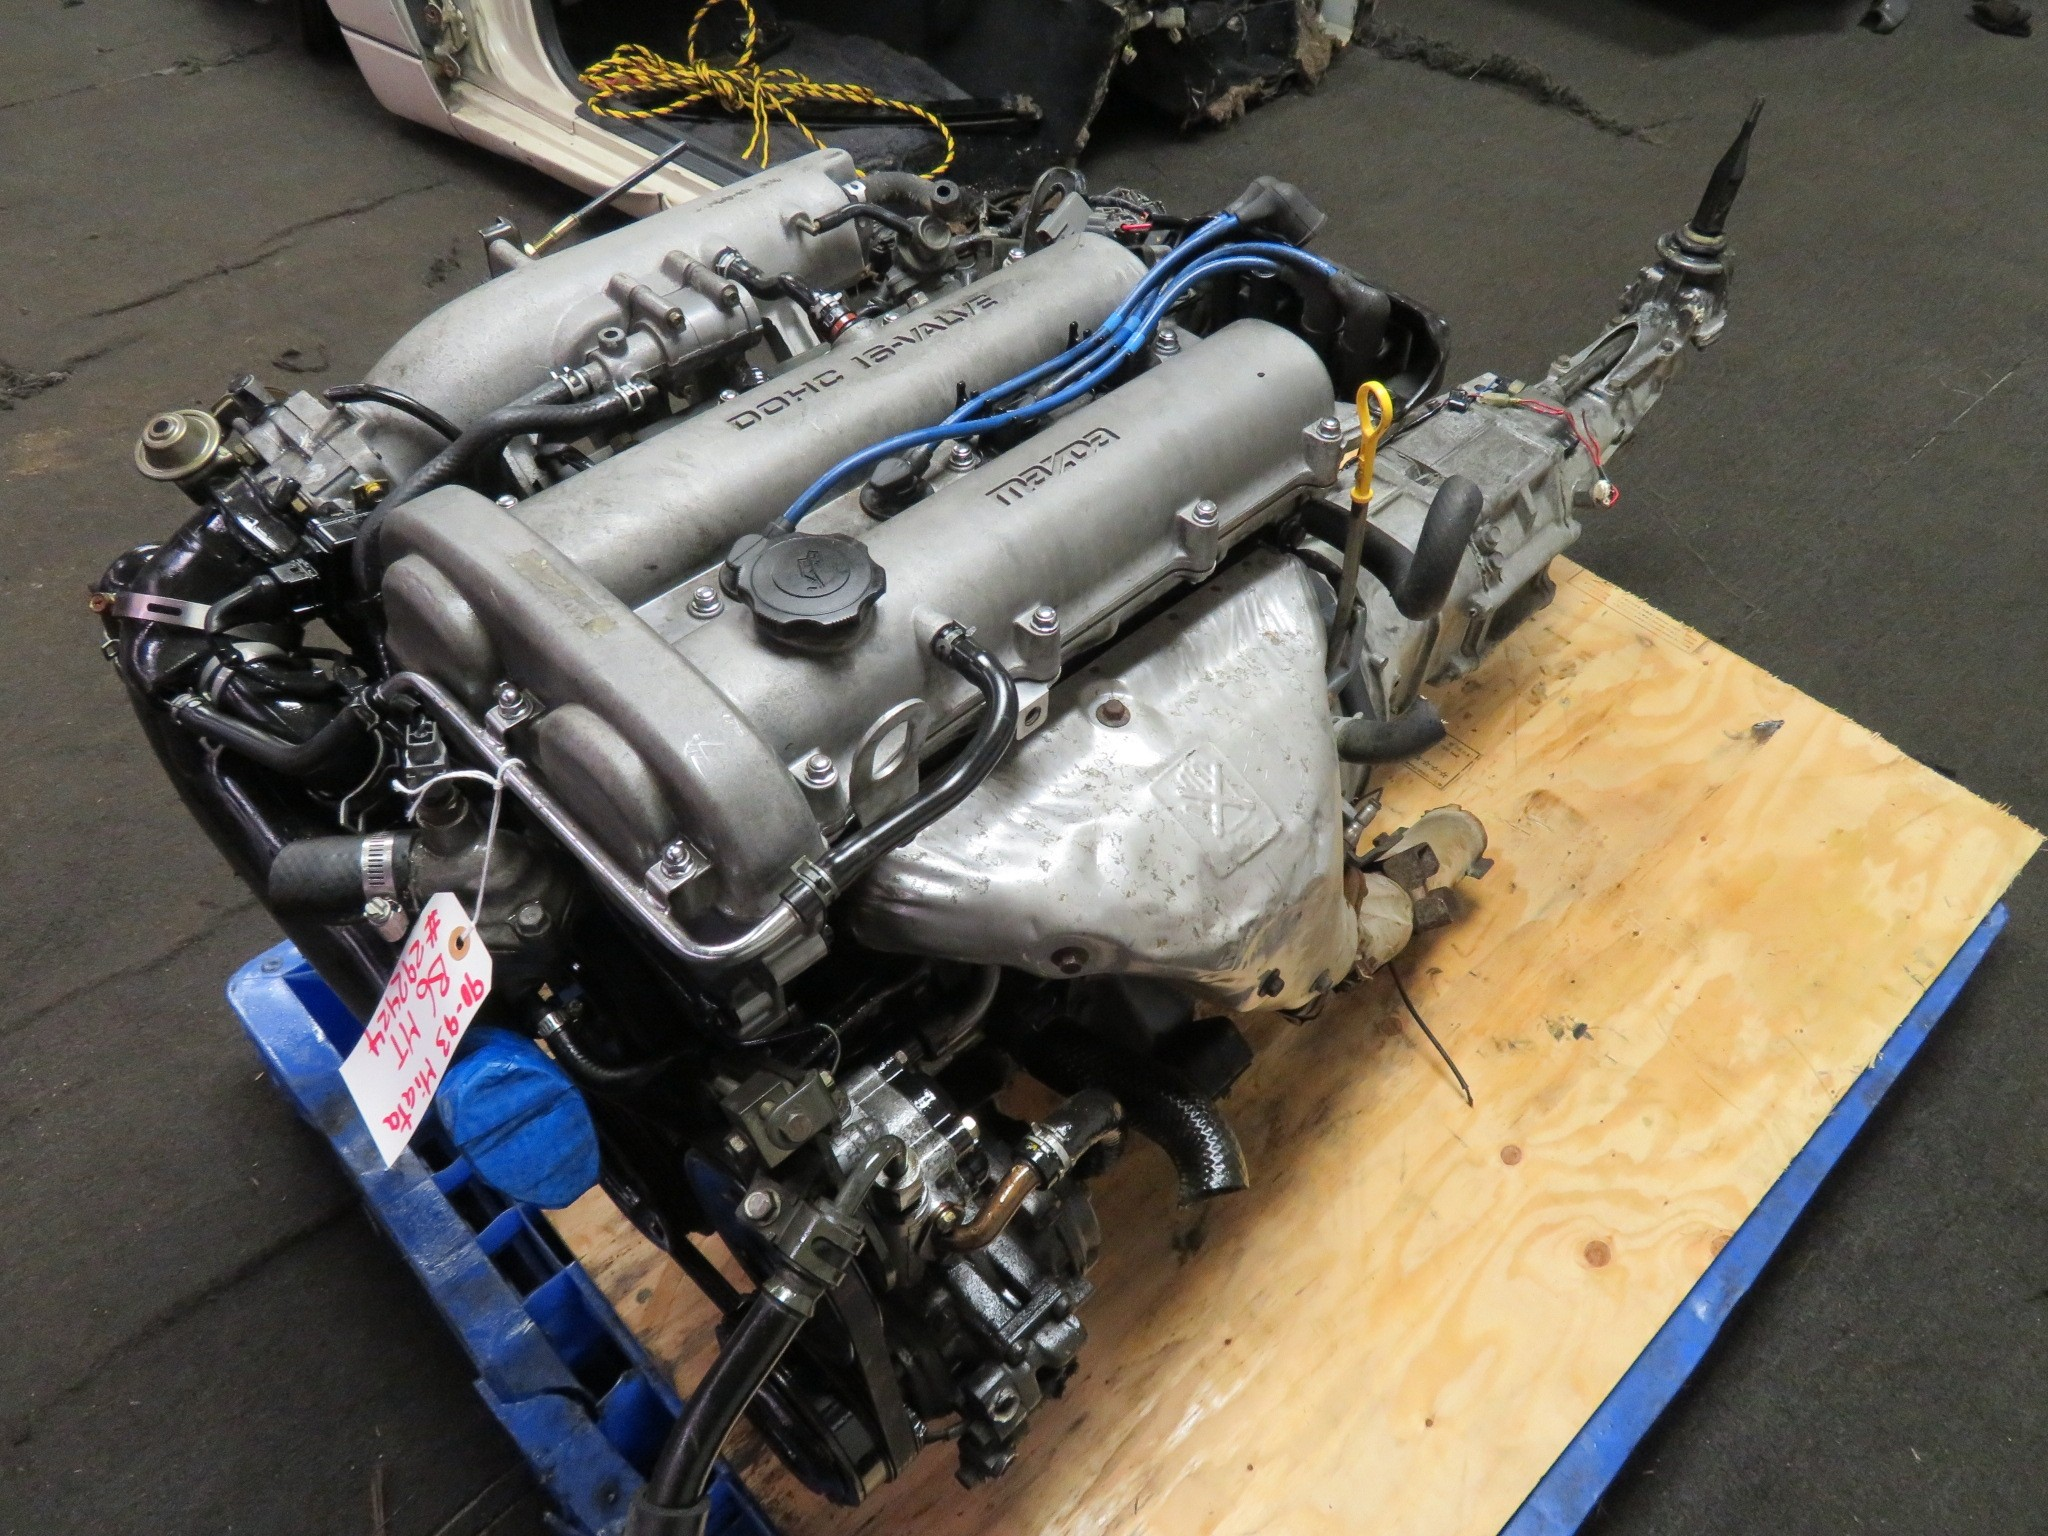 90-93 JDM MAZDA MIATA B6 1.6L DOHC ENGINE & 5 SPEED TRANSMISSION